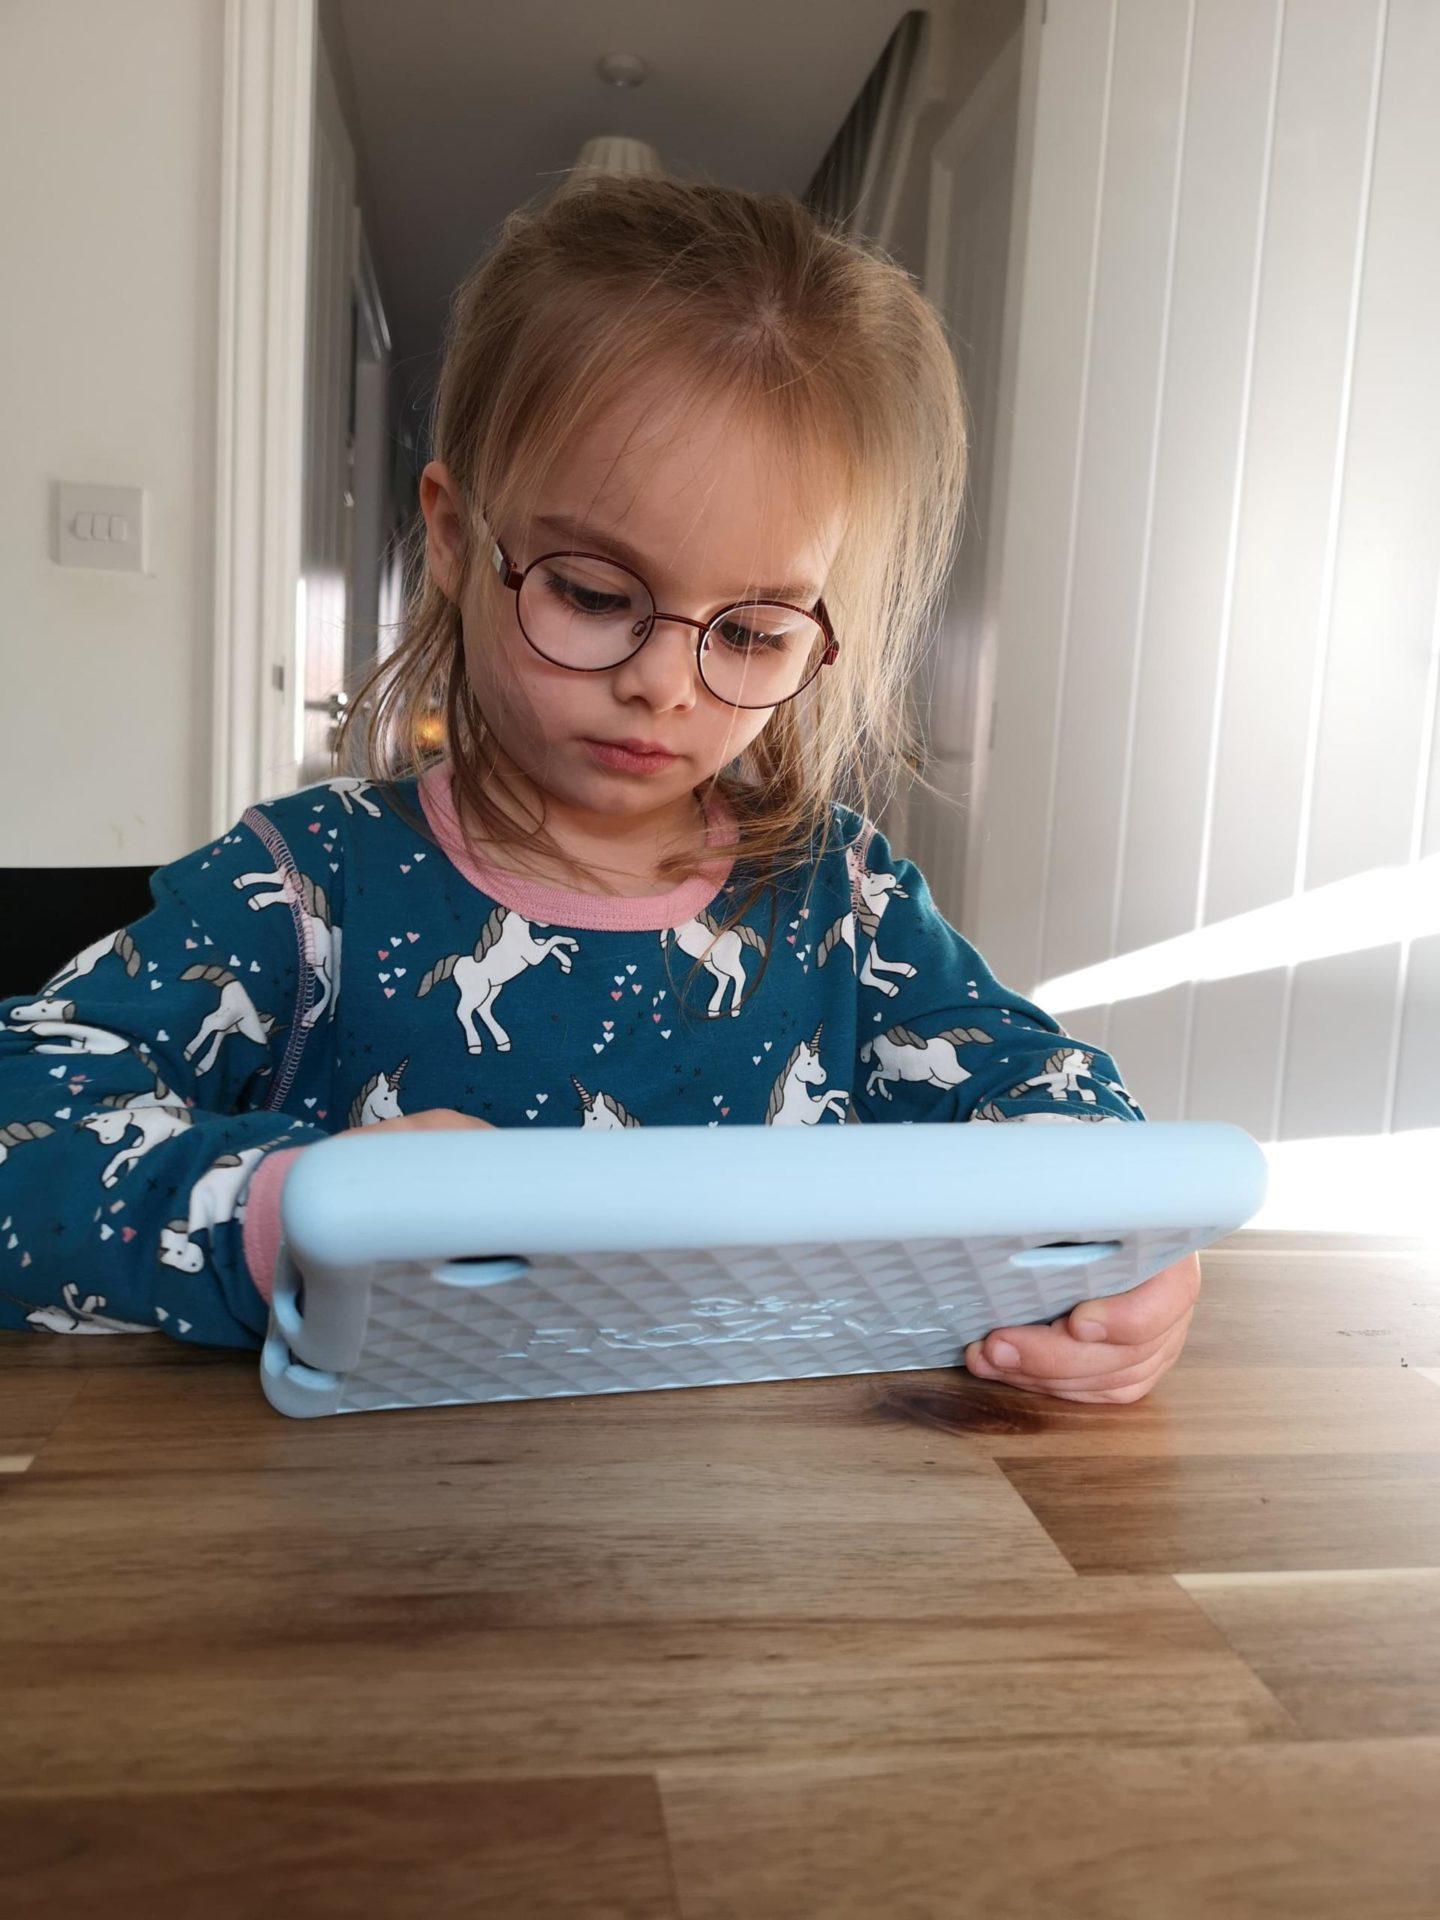 Review | Pebble Gear kids tablet